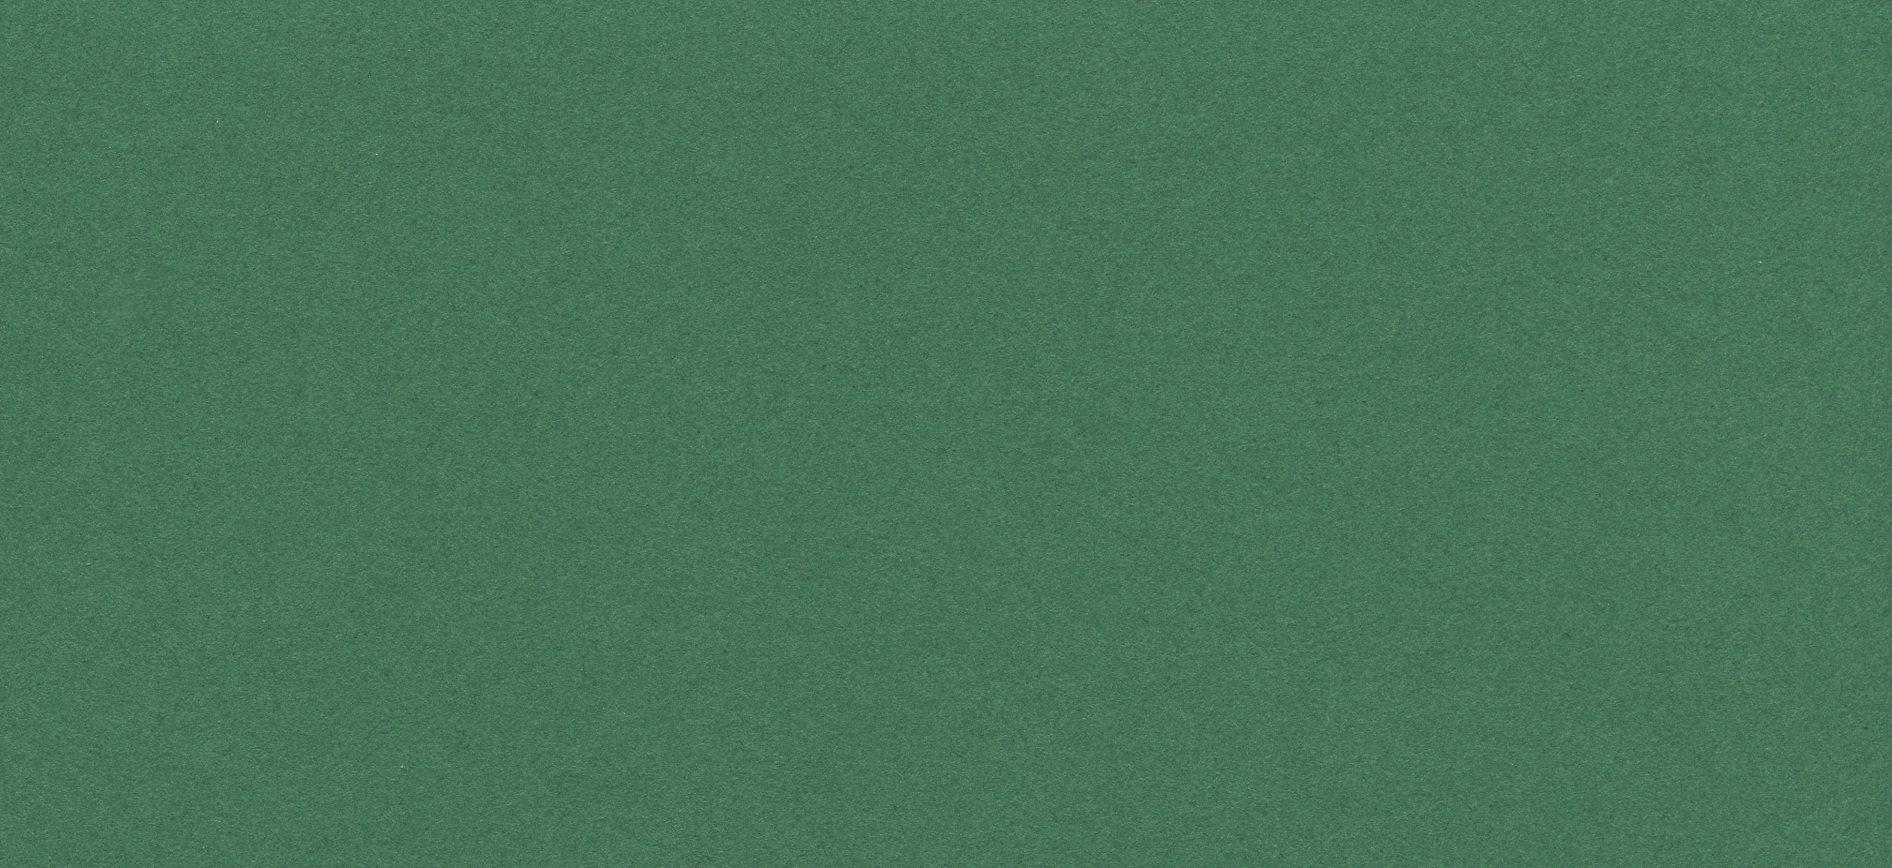 B12062 in collection Bainbridge Basics